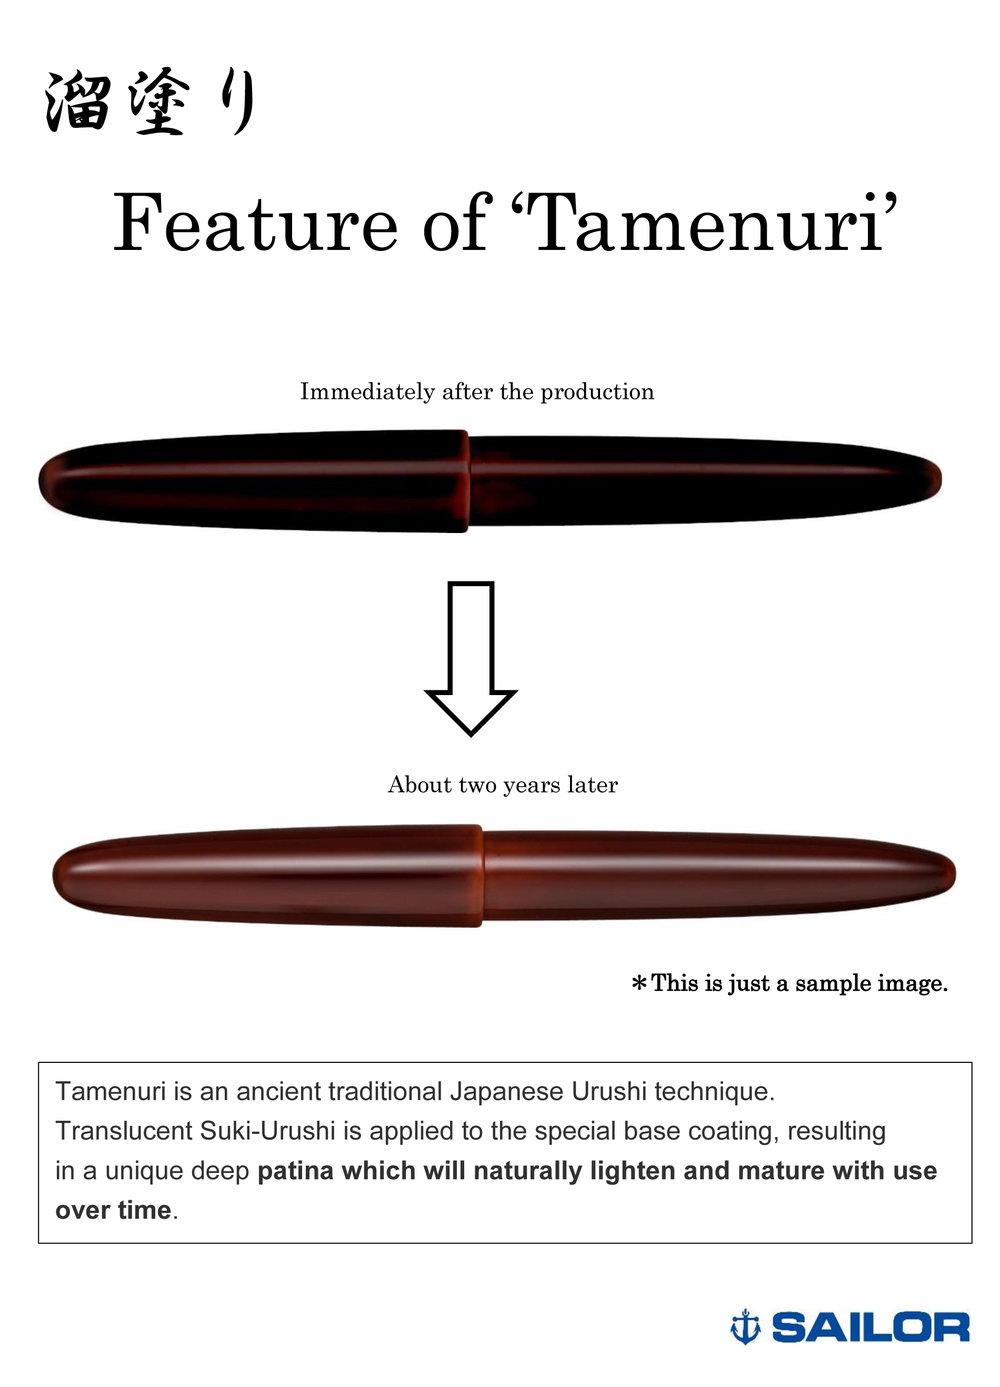 Feature of Tamenuri.jpg